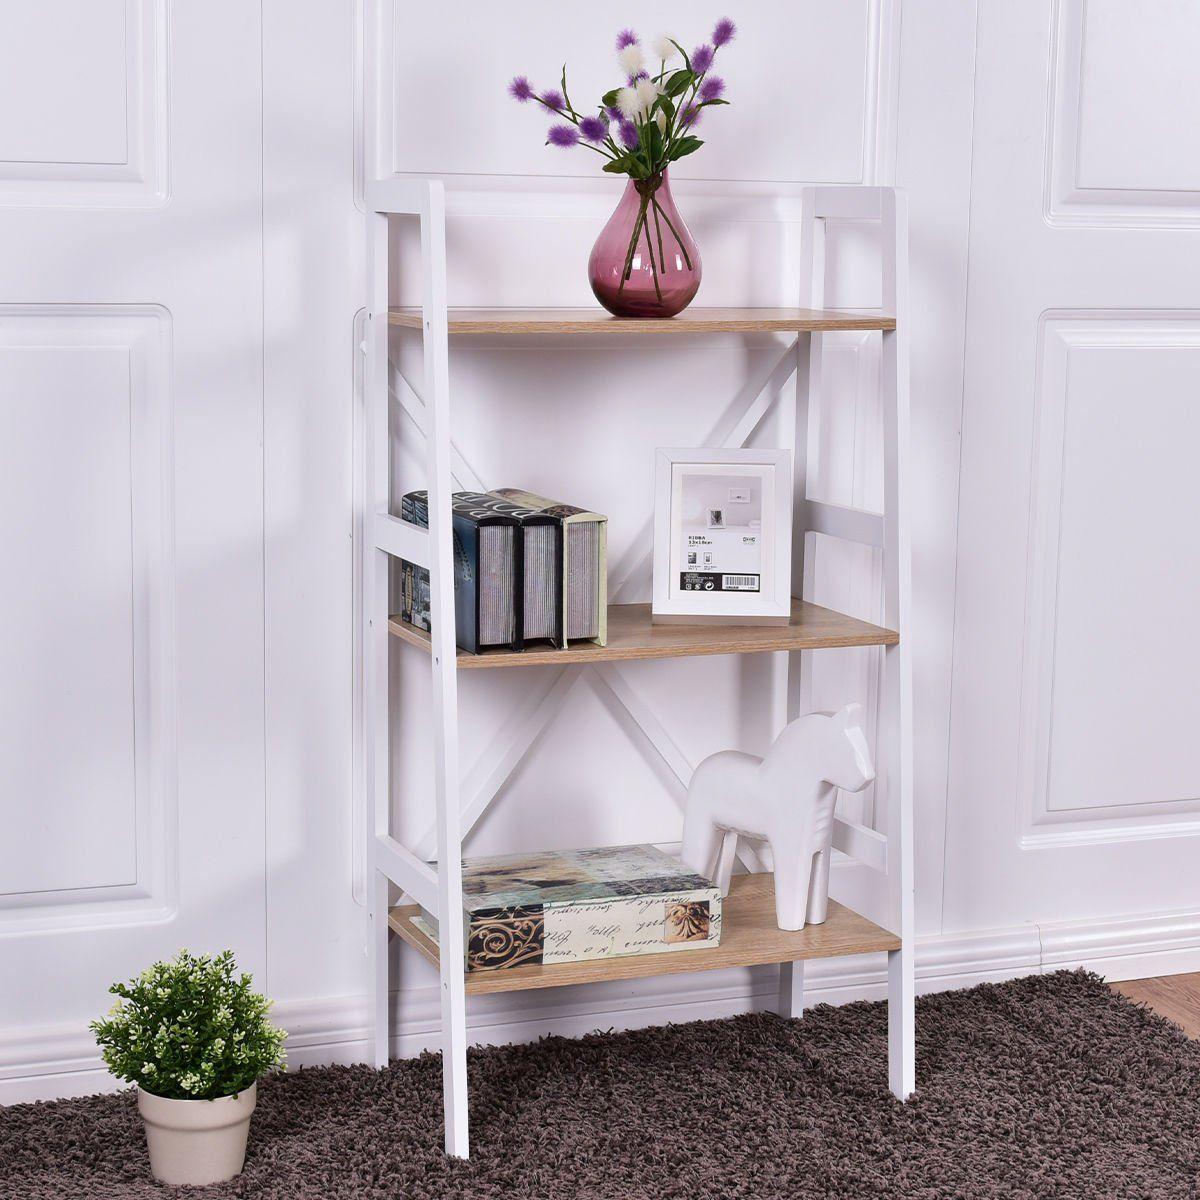 Bookshelf bookcase ladder storage shelves book rack new wall stand